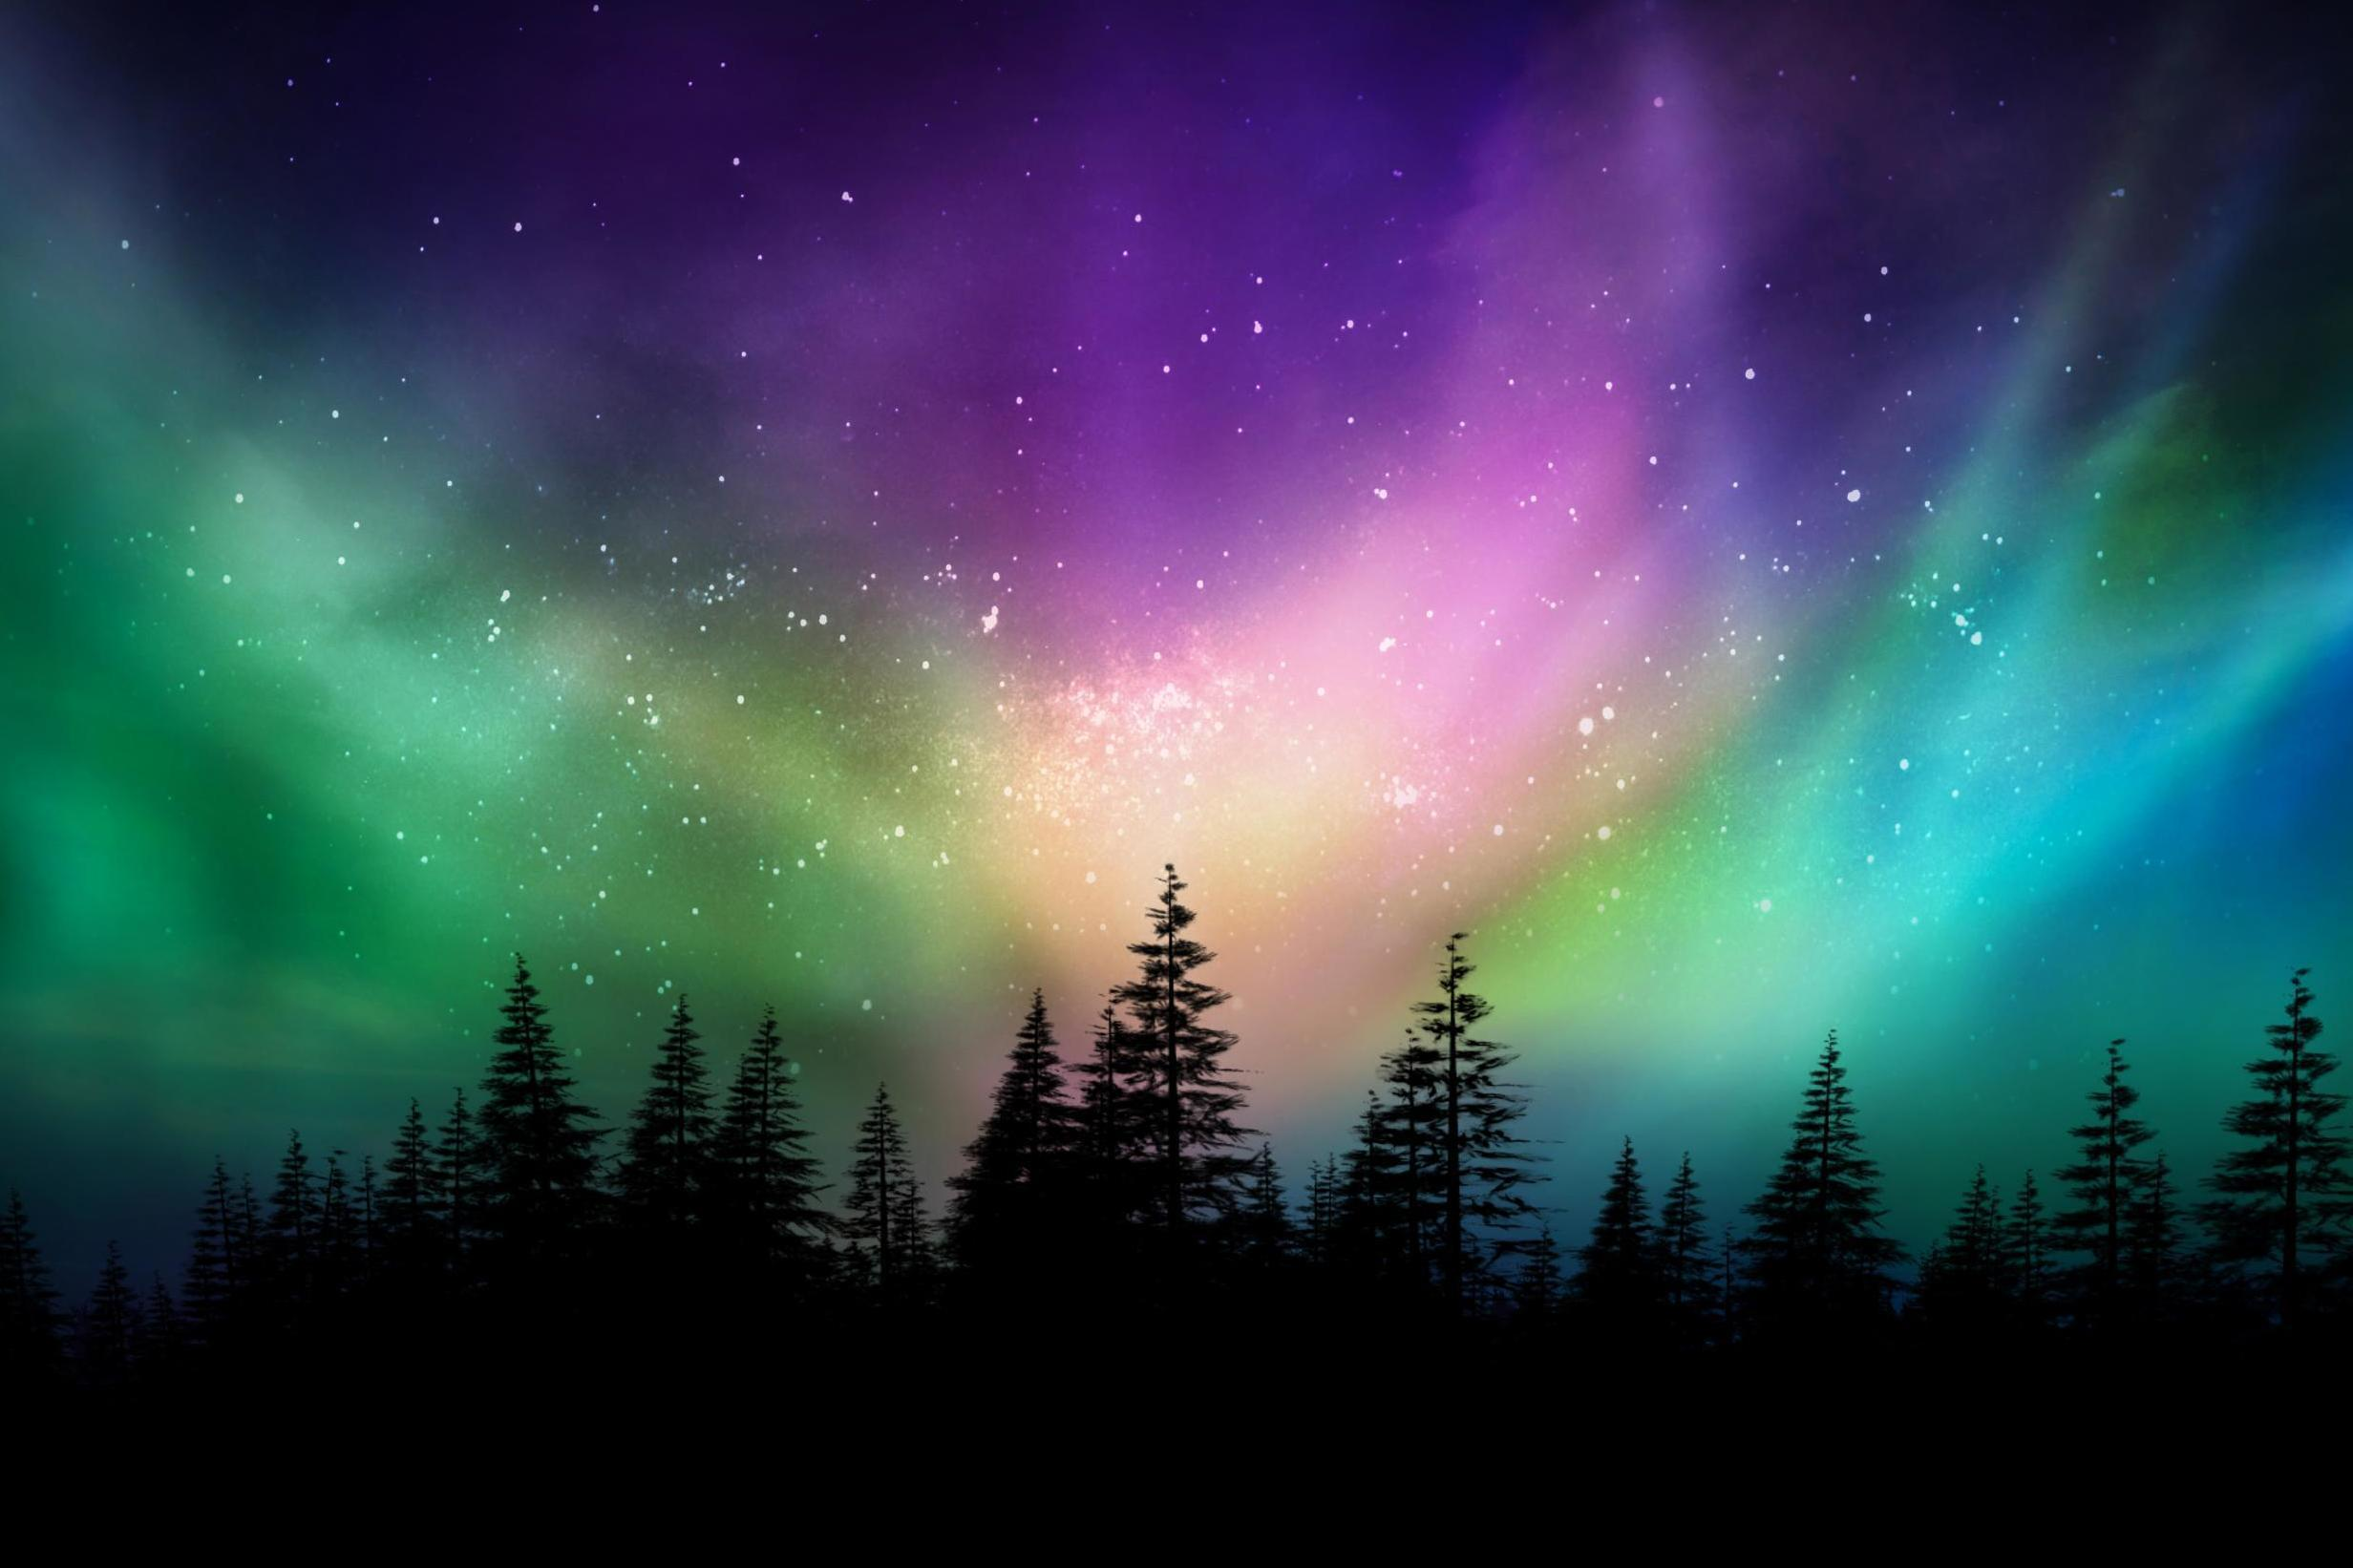 Aurora Borealis. Photo source: independent.co.uk